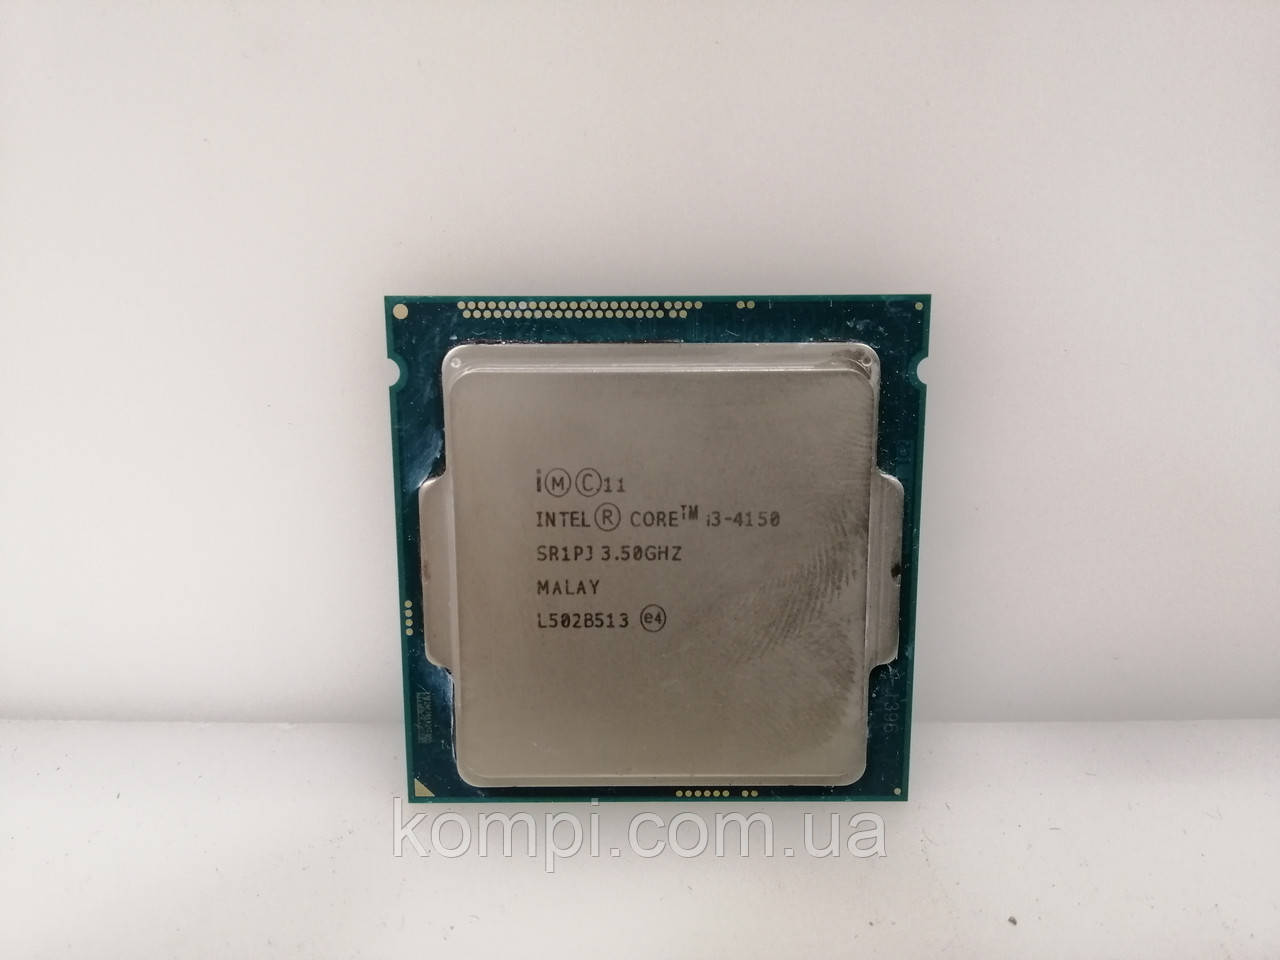 Процессор Intel  Core™ i3-4150  s1150  (2x 3.5 GHz 6mb)